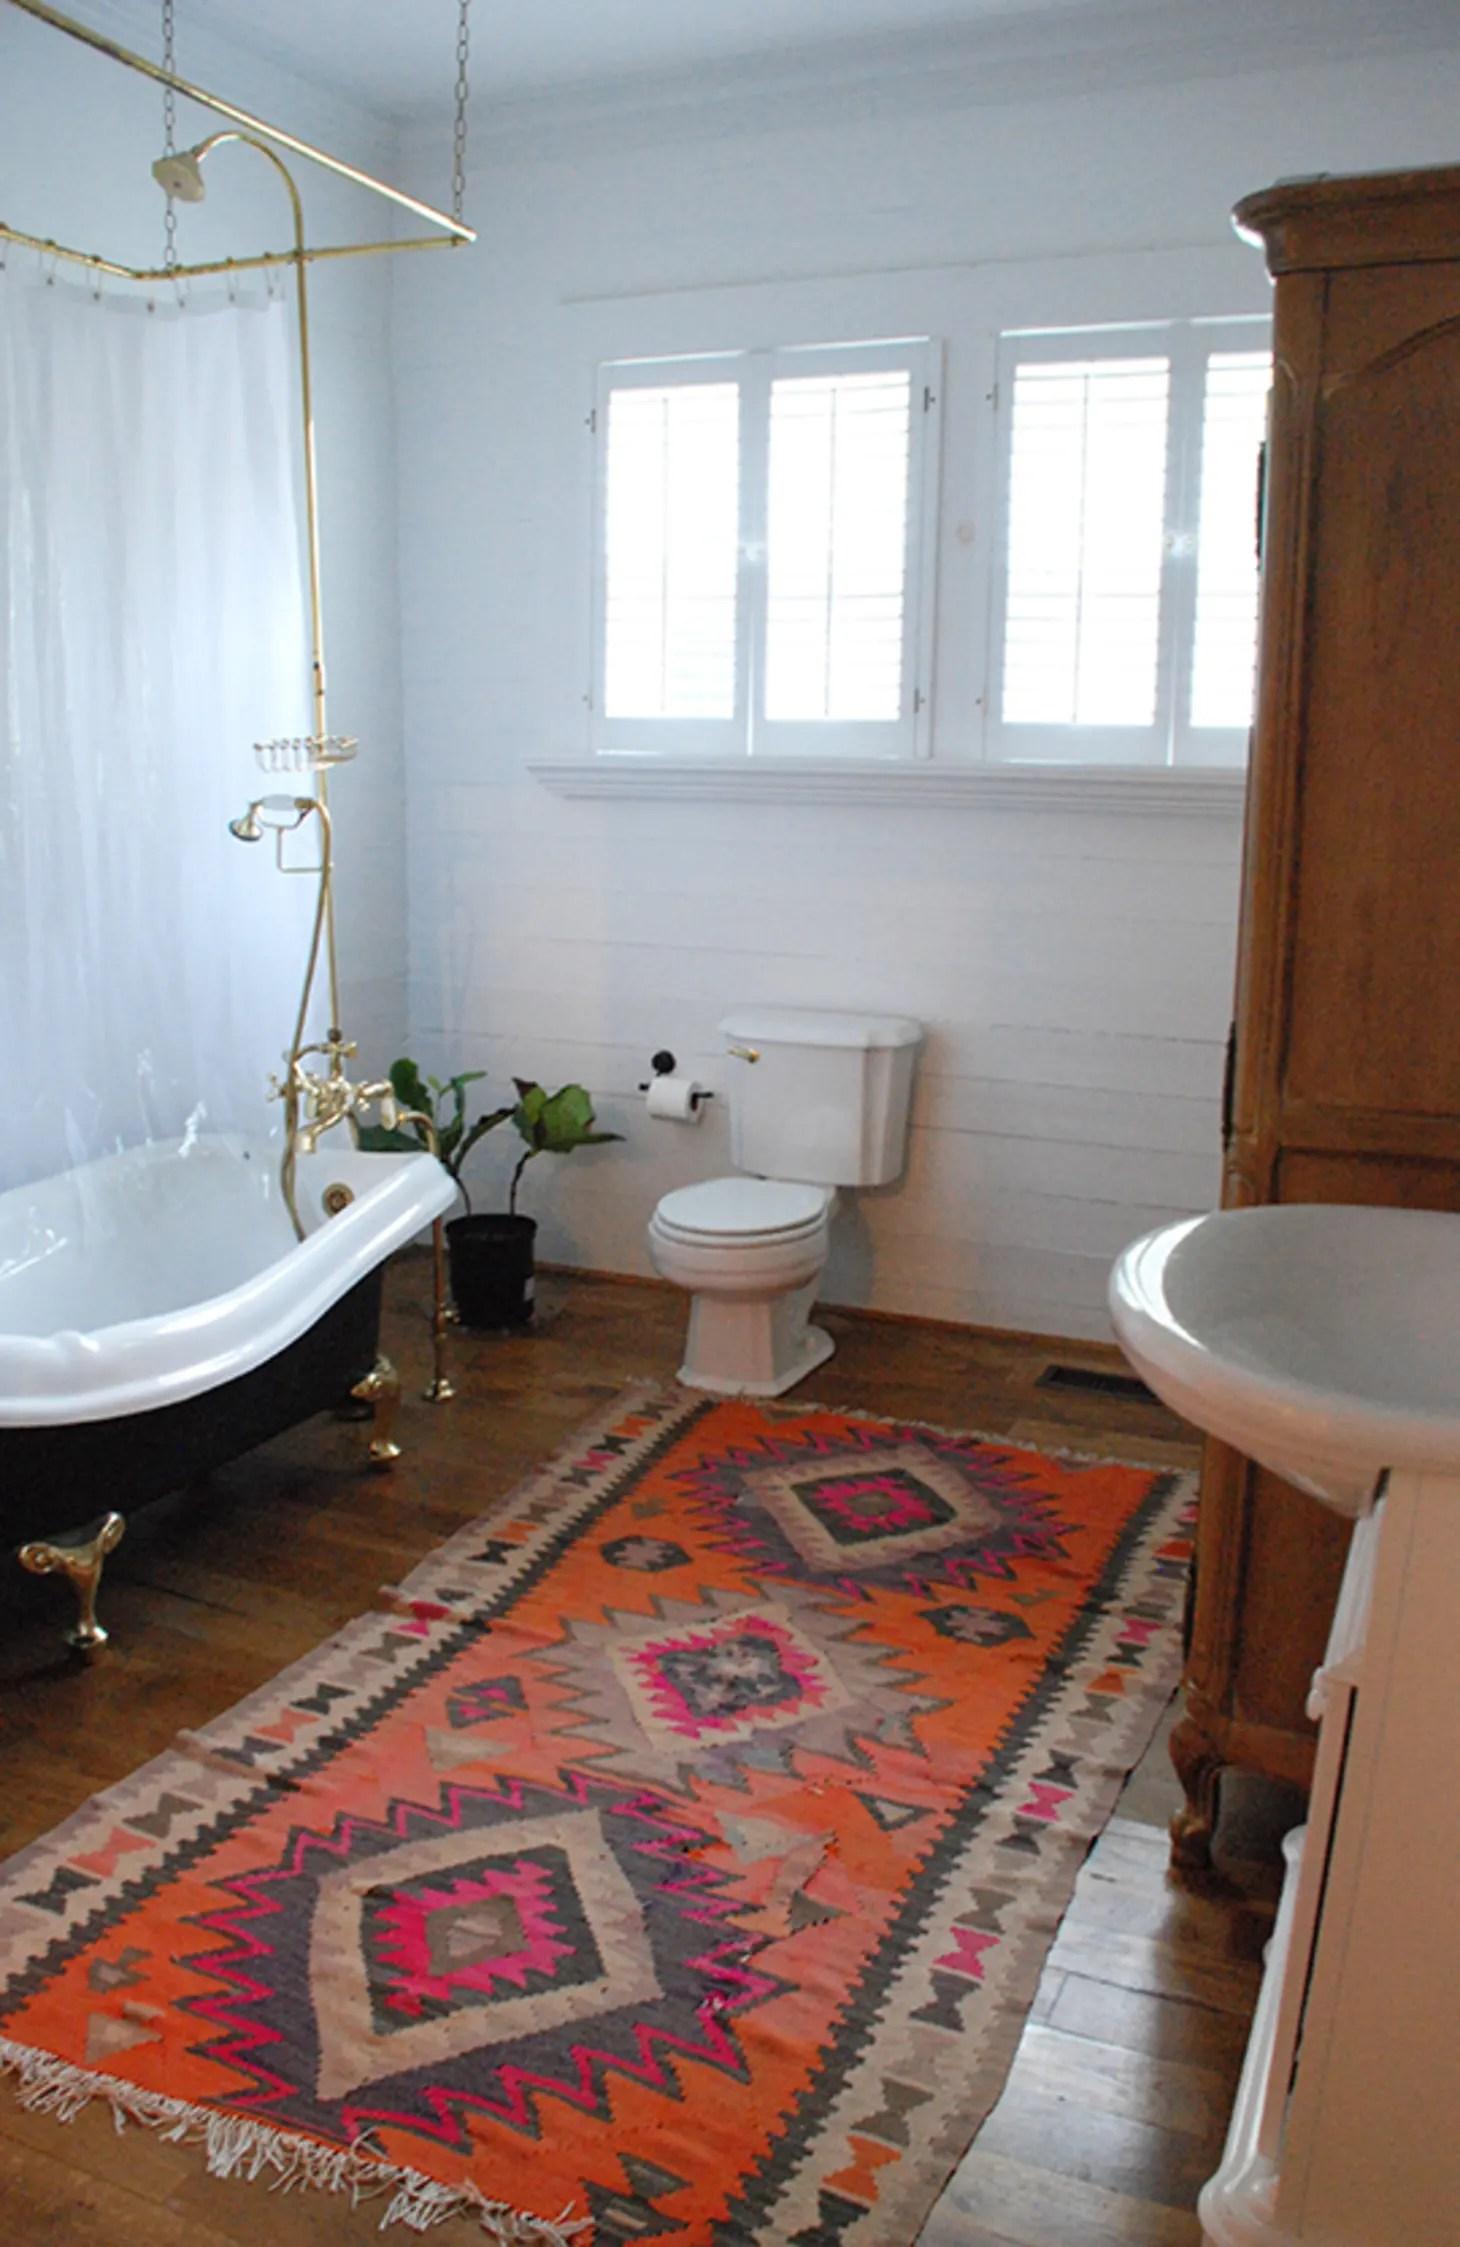 Easy Reversible Design Ideas for Rental Bathrooms ... on Apartment Bathroom Ideas  id=16181